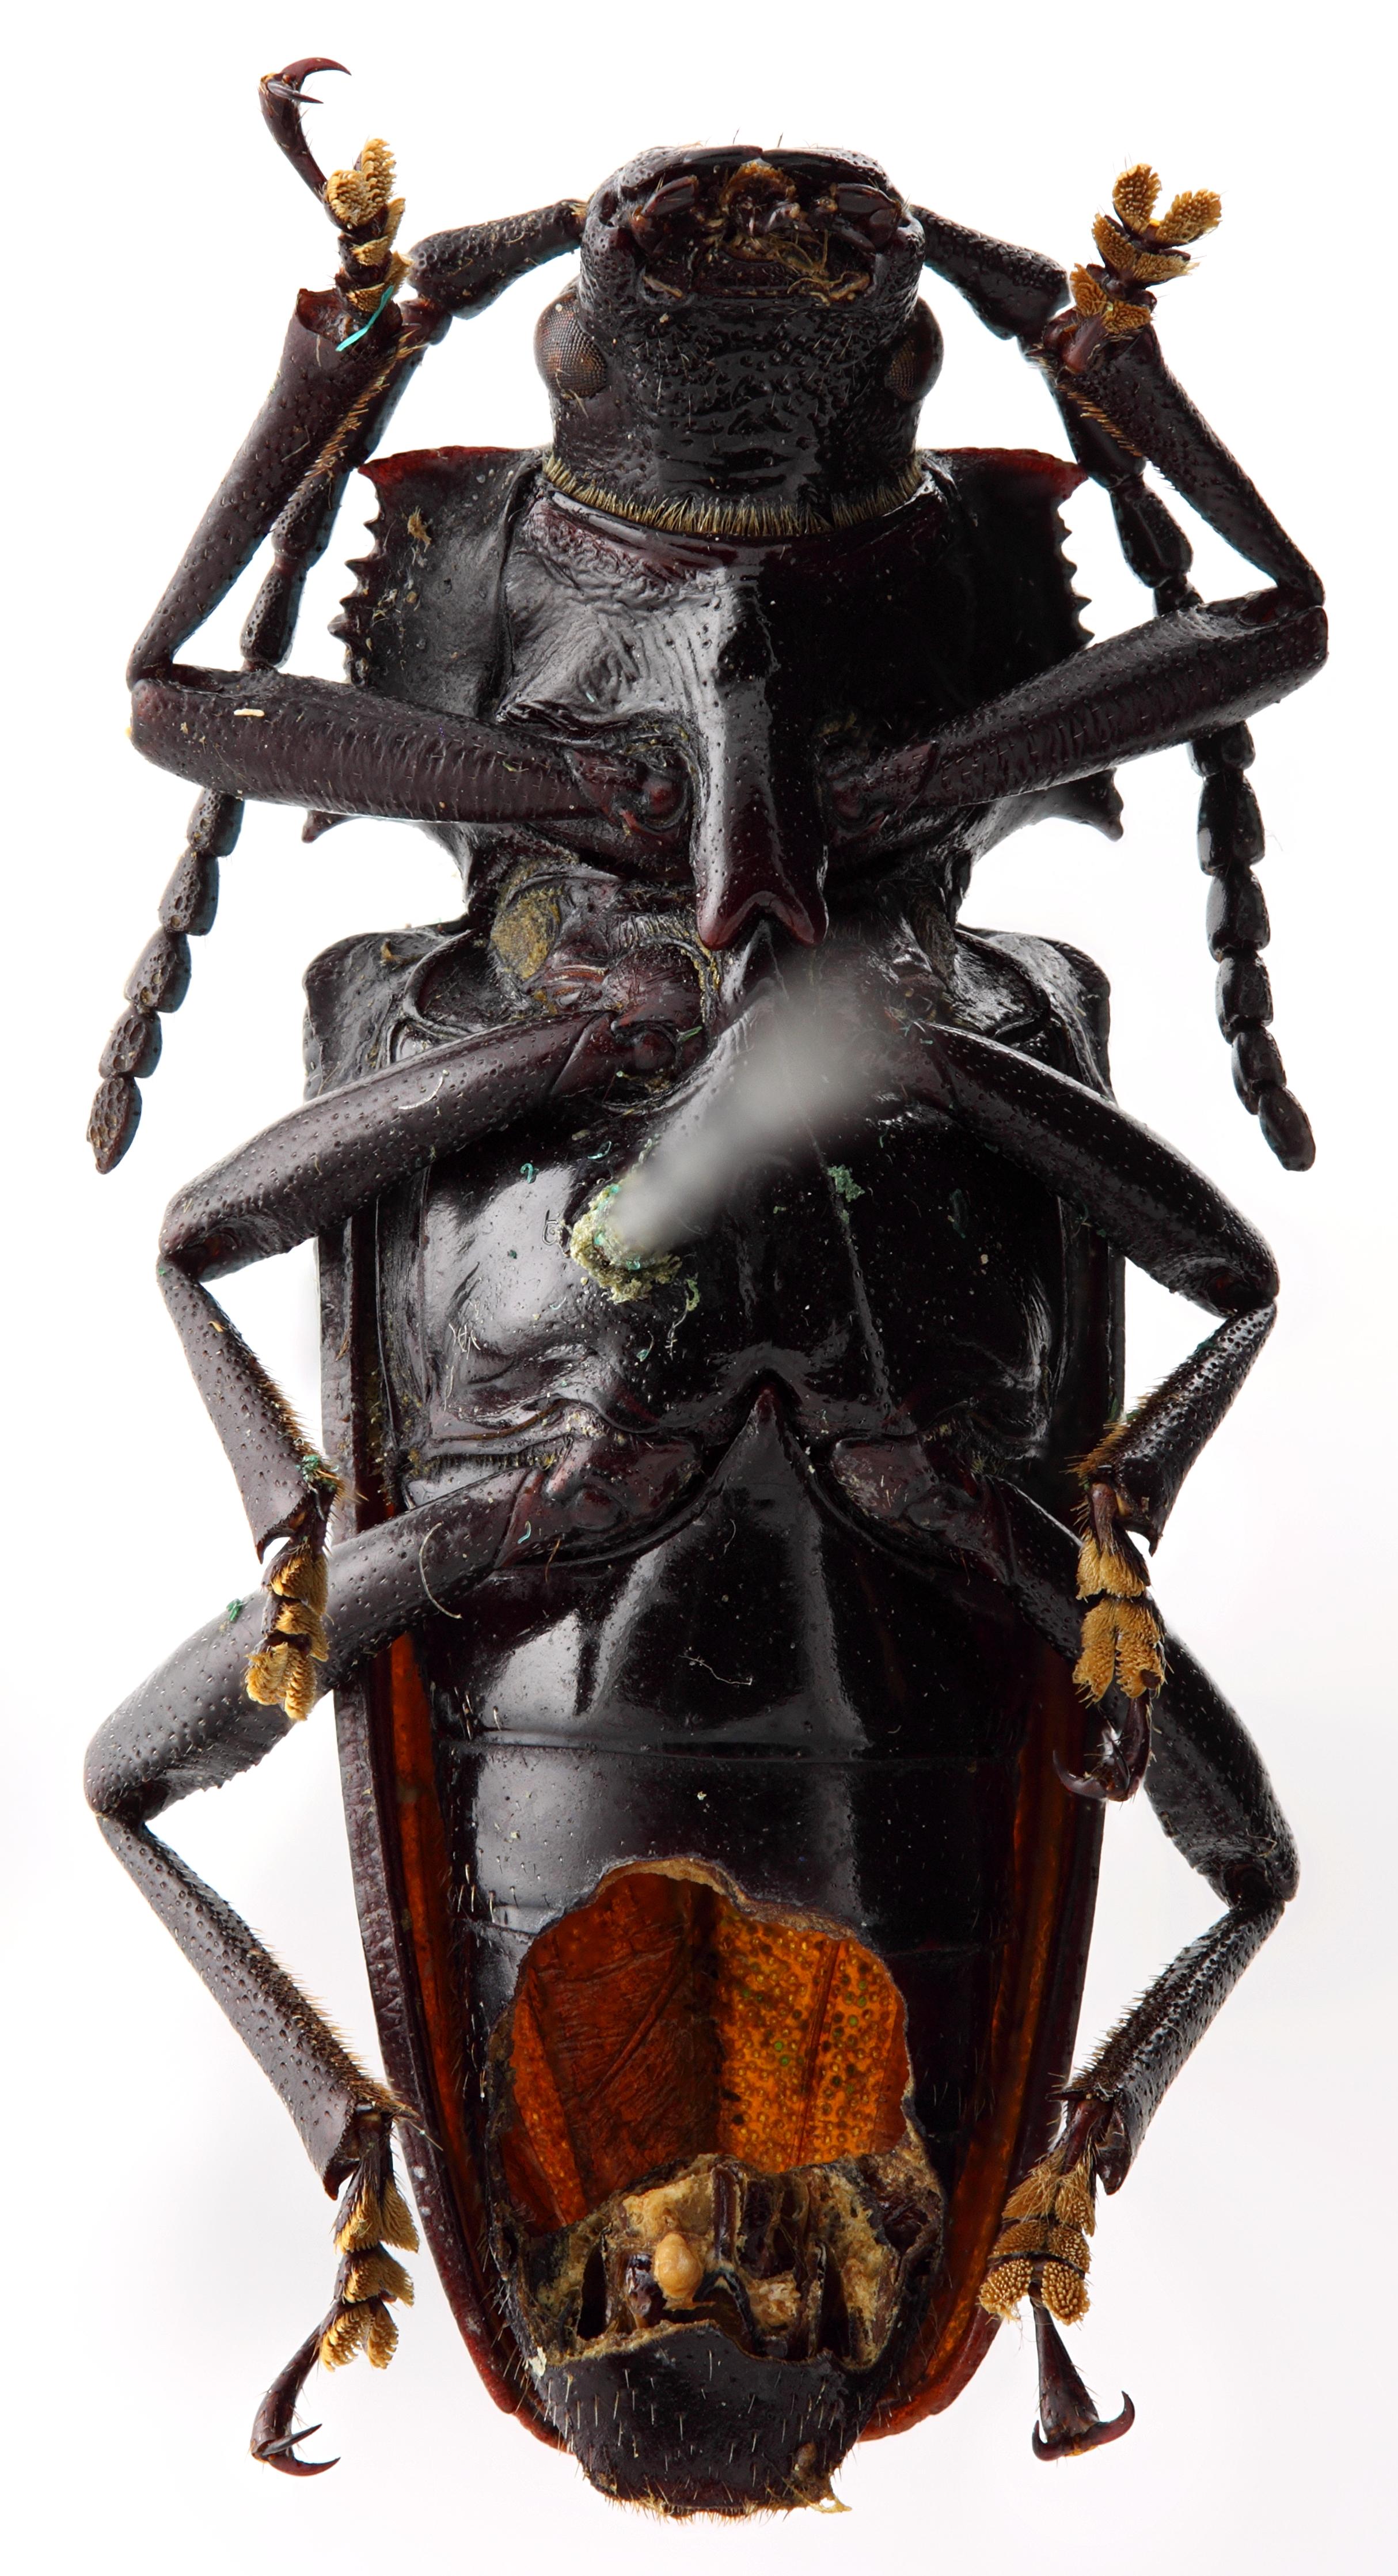 Solenoptera fraudulenta 03 SP Paratype F 022 BRUS 201405.jpg